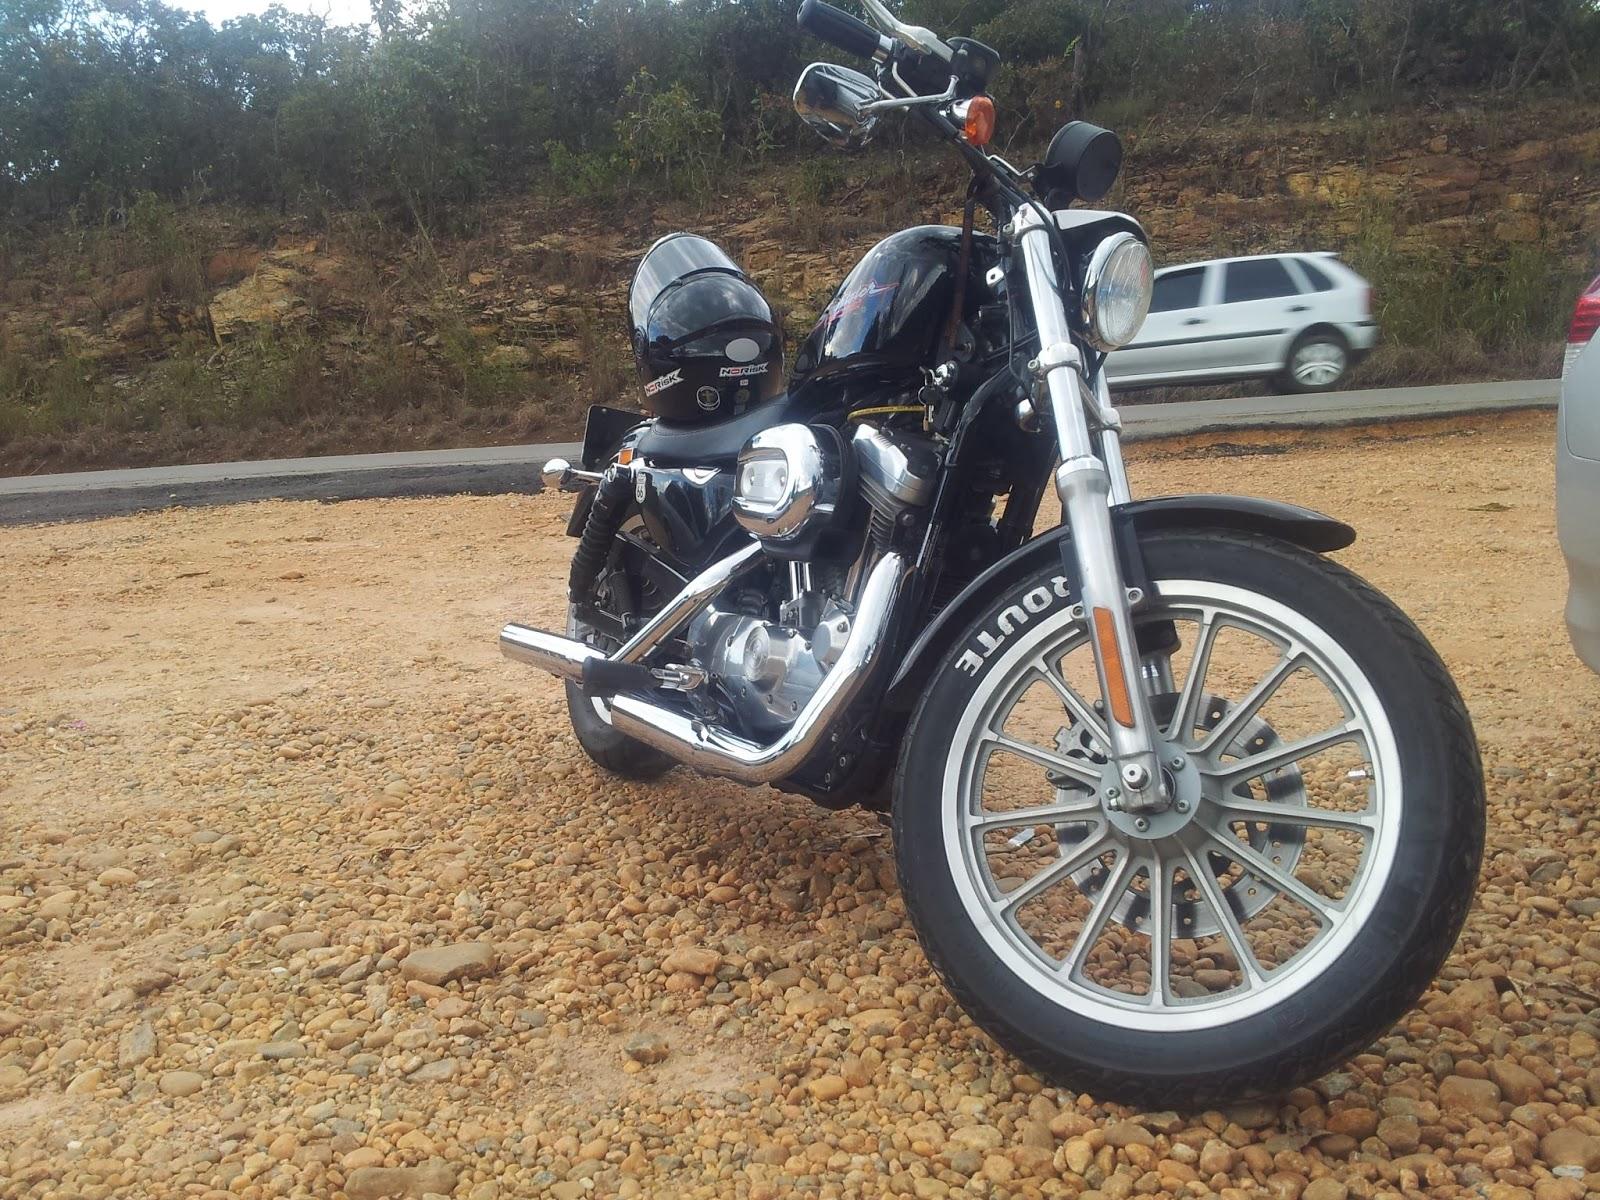 Avaliação e Teste na Harley Davidson Sportster 883 carburada ano 2004